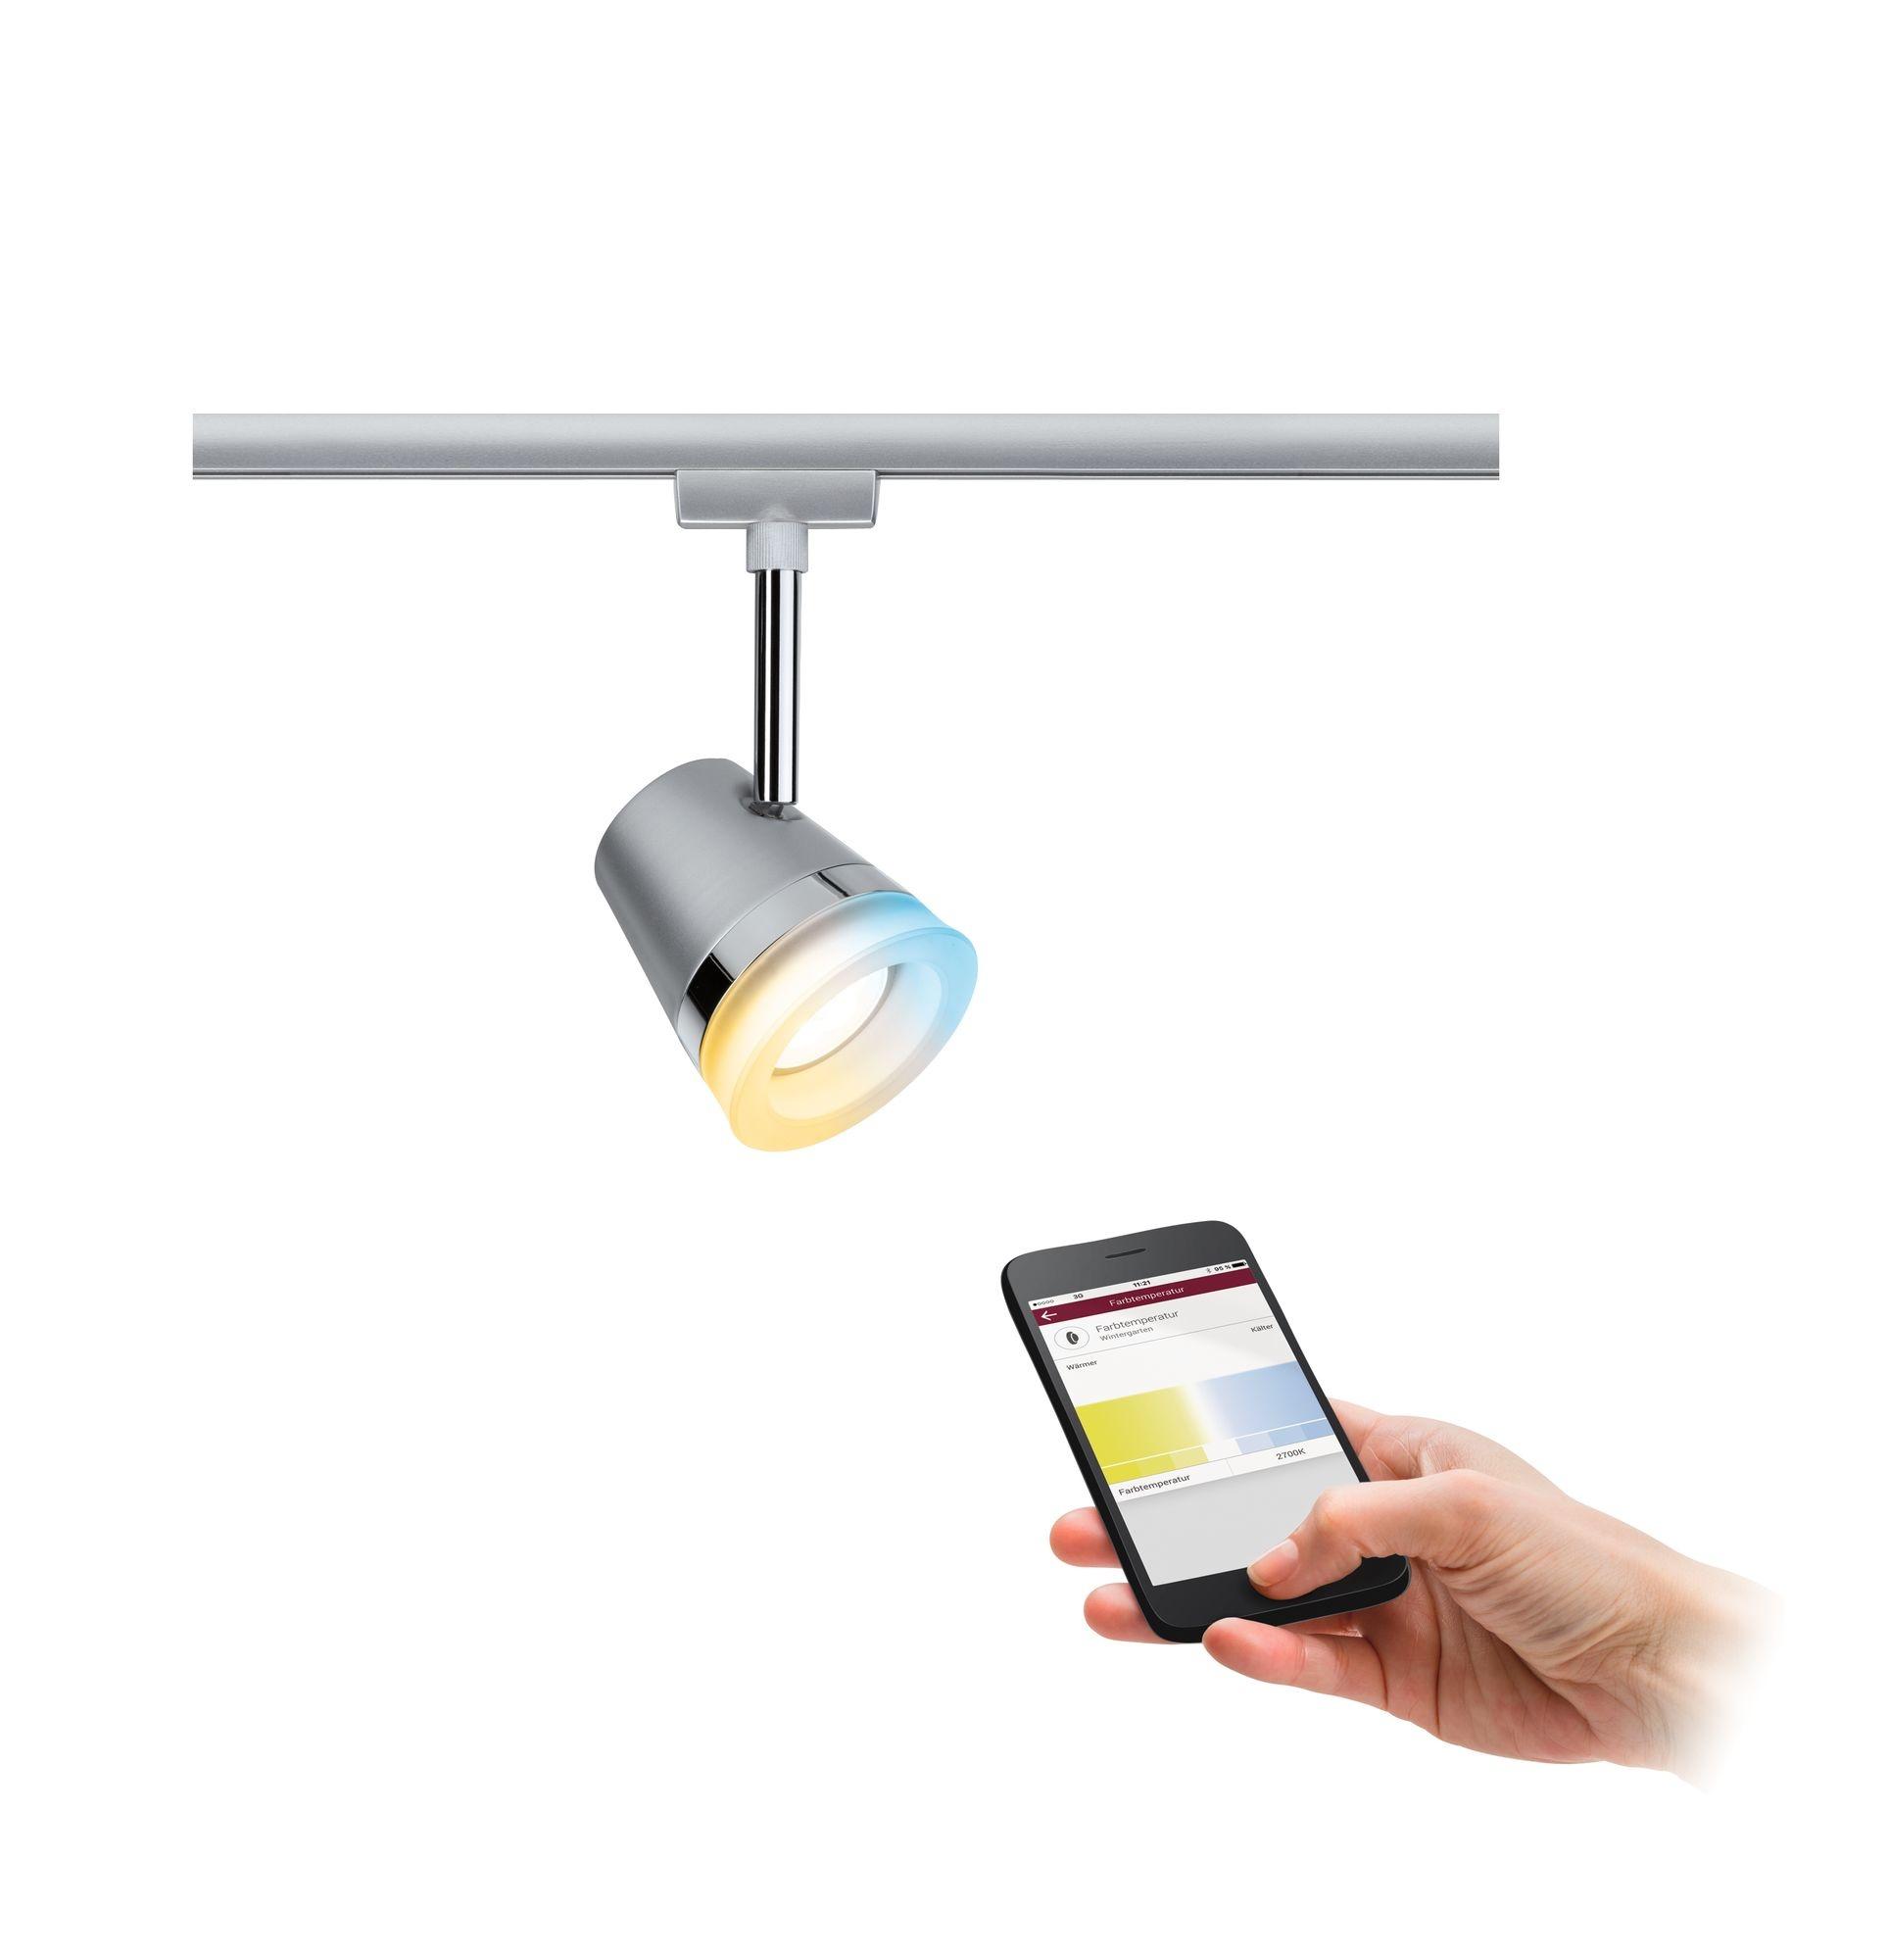 Paulmann URail Spot Cone Smart Chrom matt#Chrom max. 1x5W GU10 dimmbar inkl. Zigbee/Tunable White Leuchtmittel